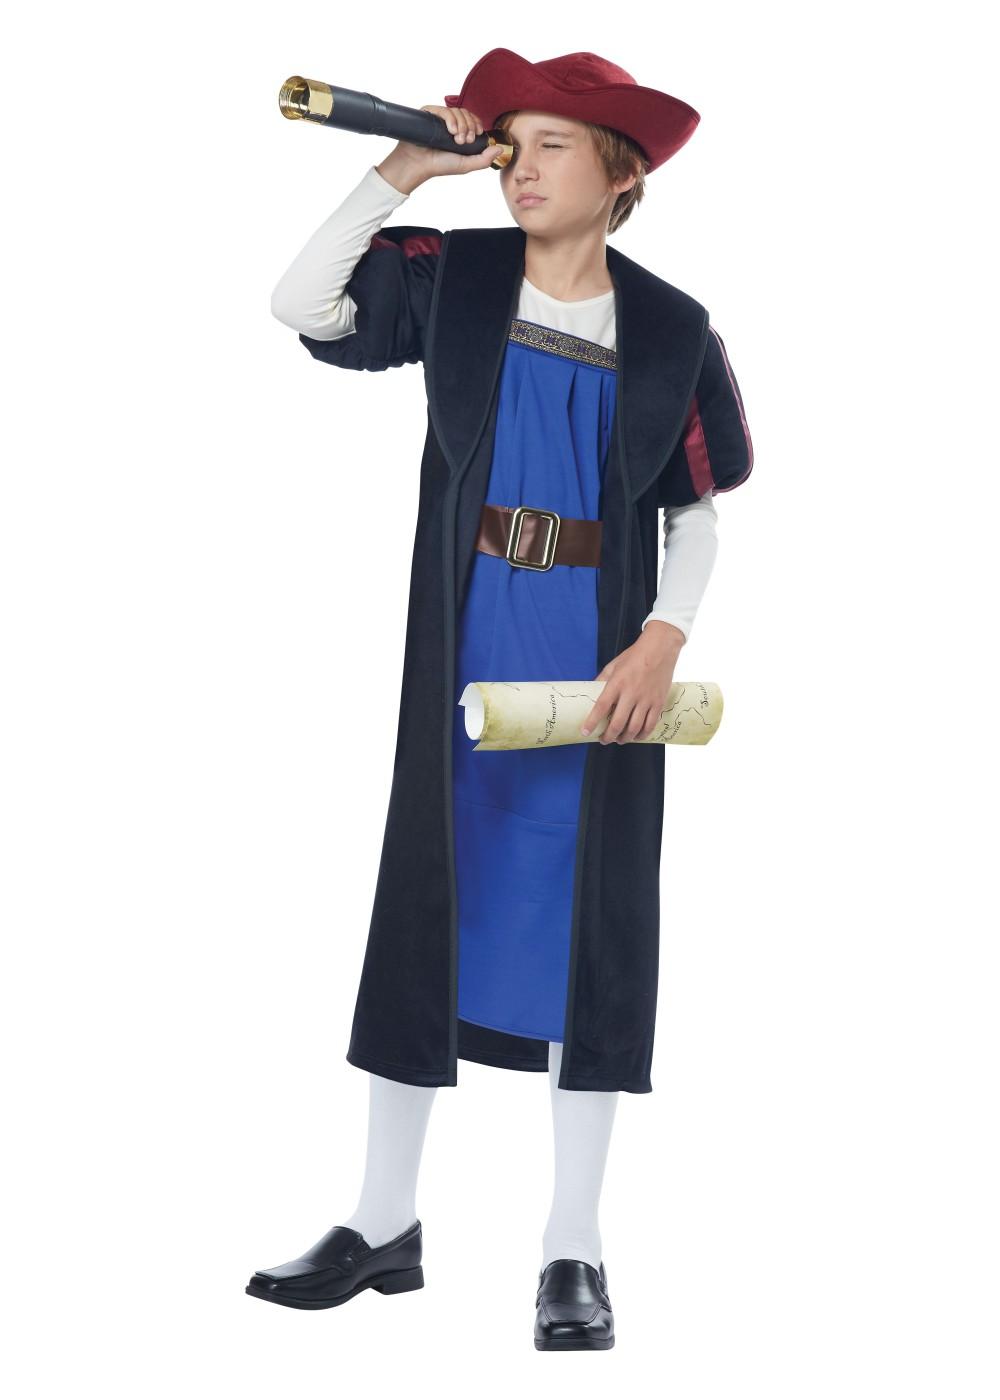 christopher columbus boy costume historical costumes